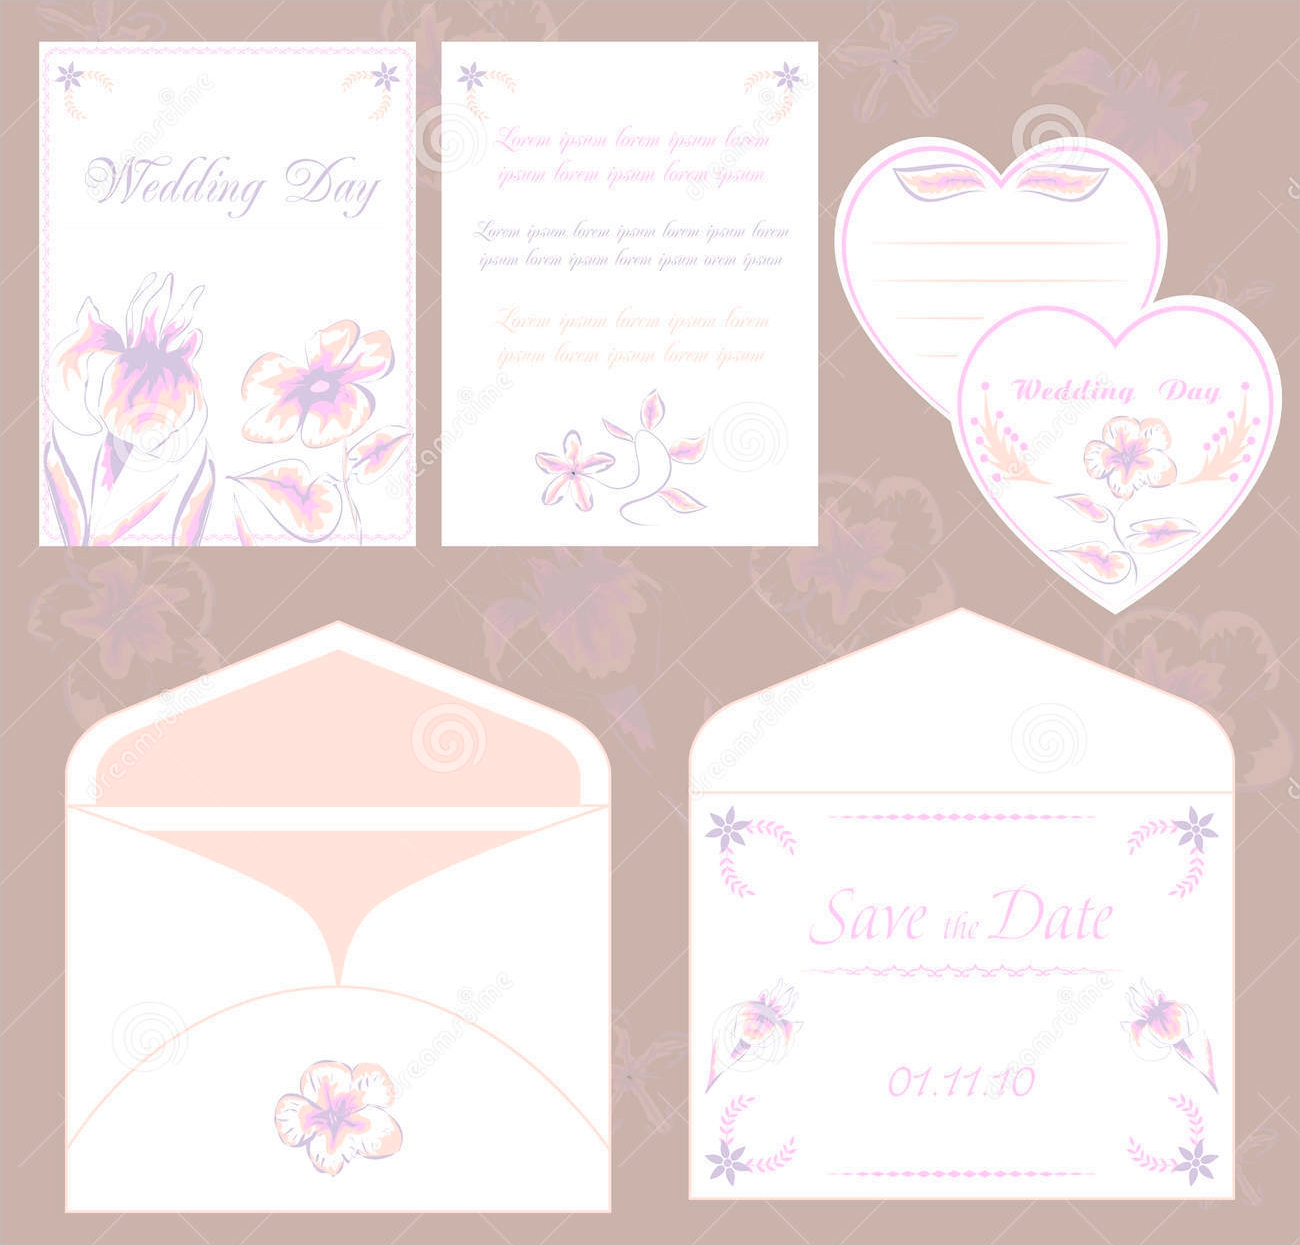 wedding invitation envelope design